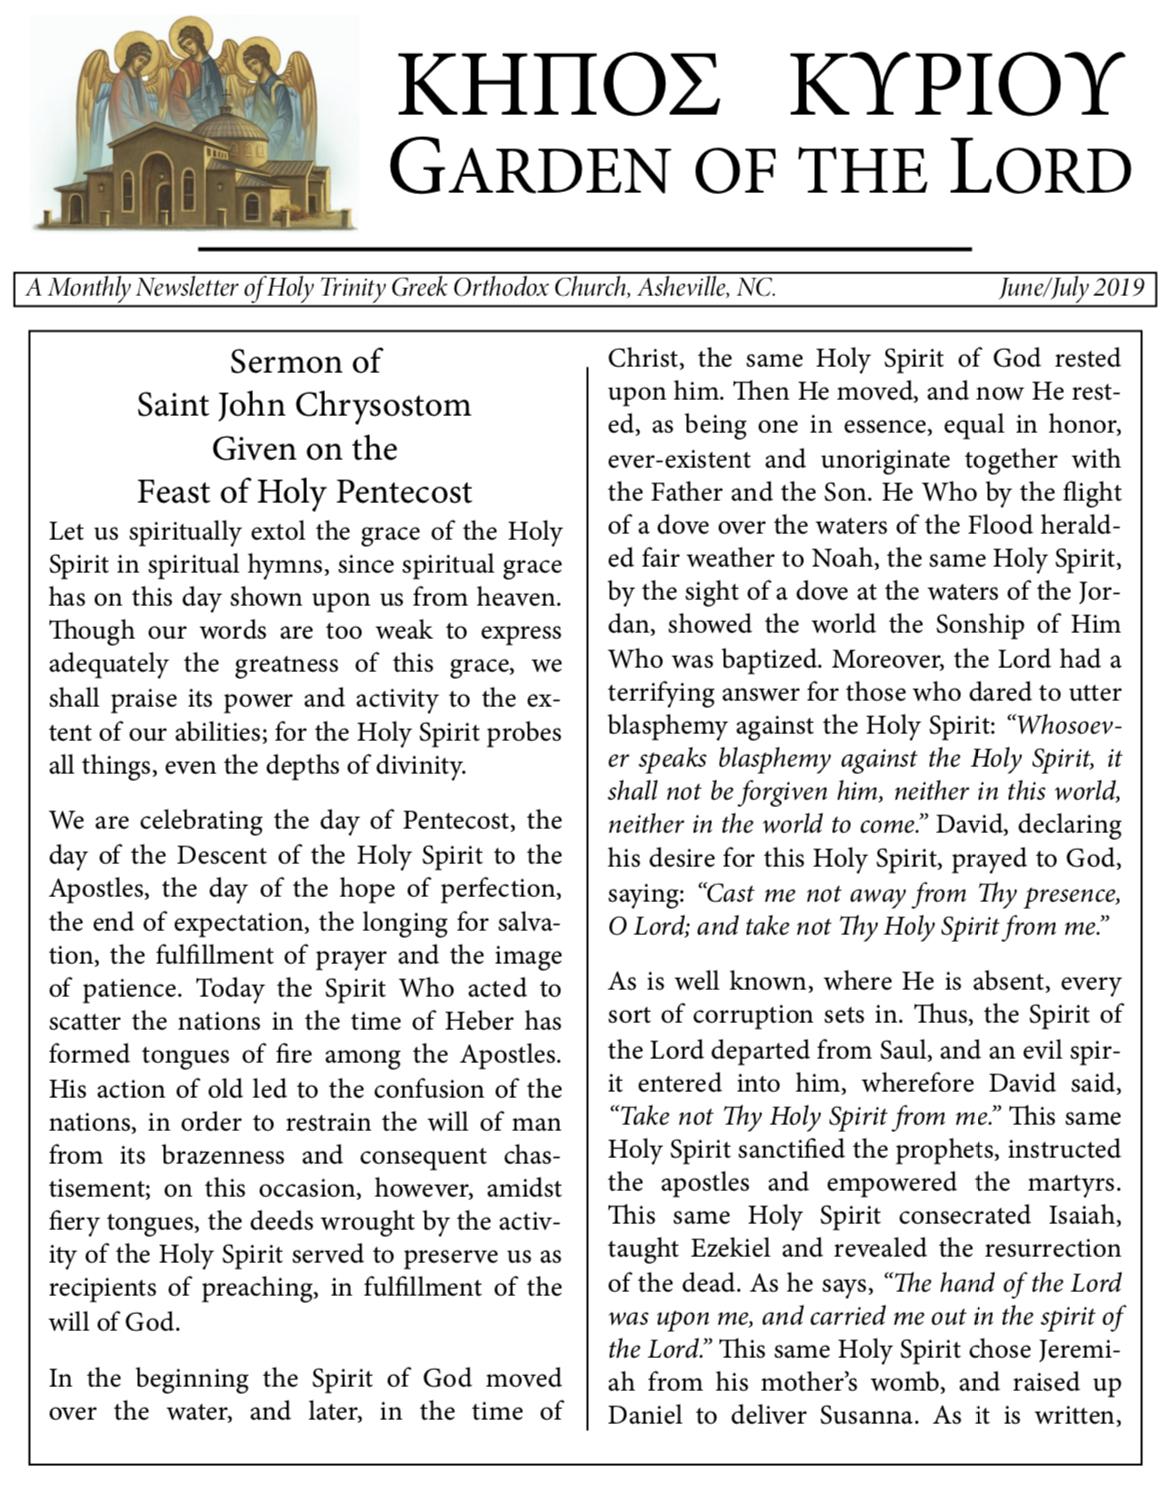 June July Newsletter Screenshot.png